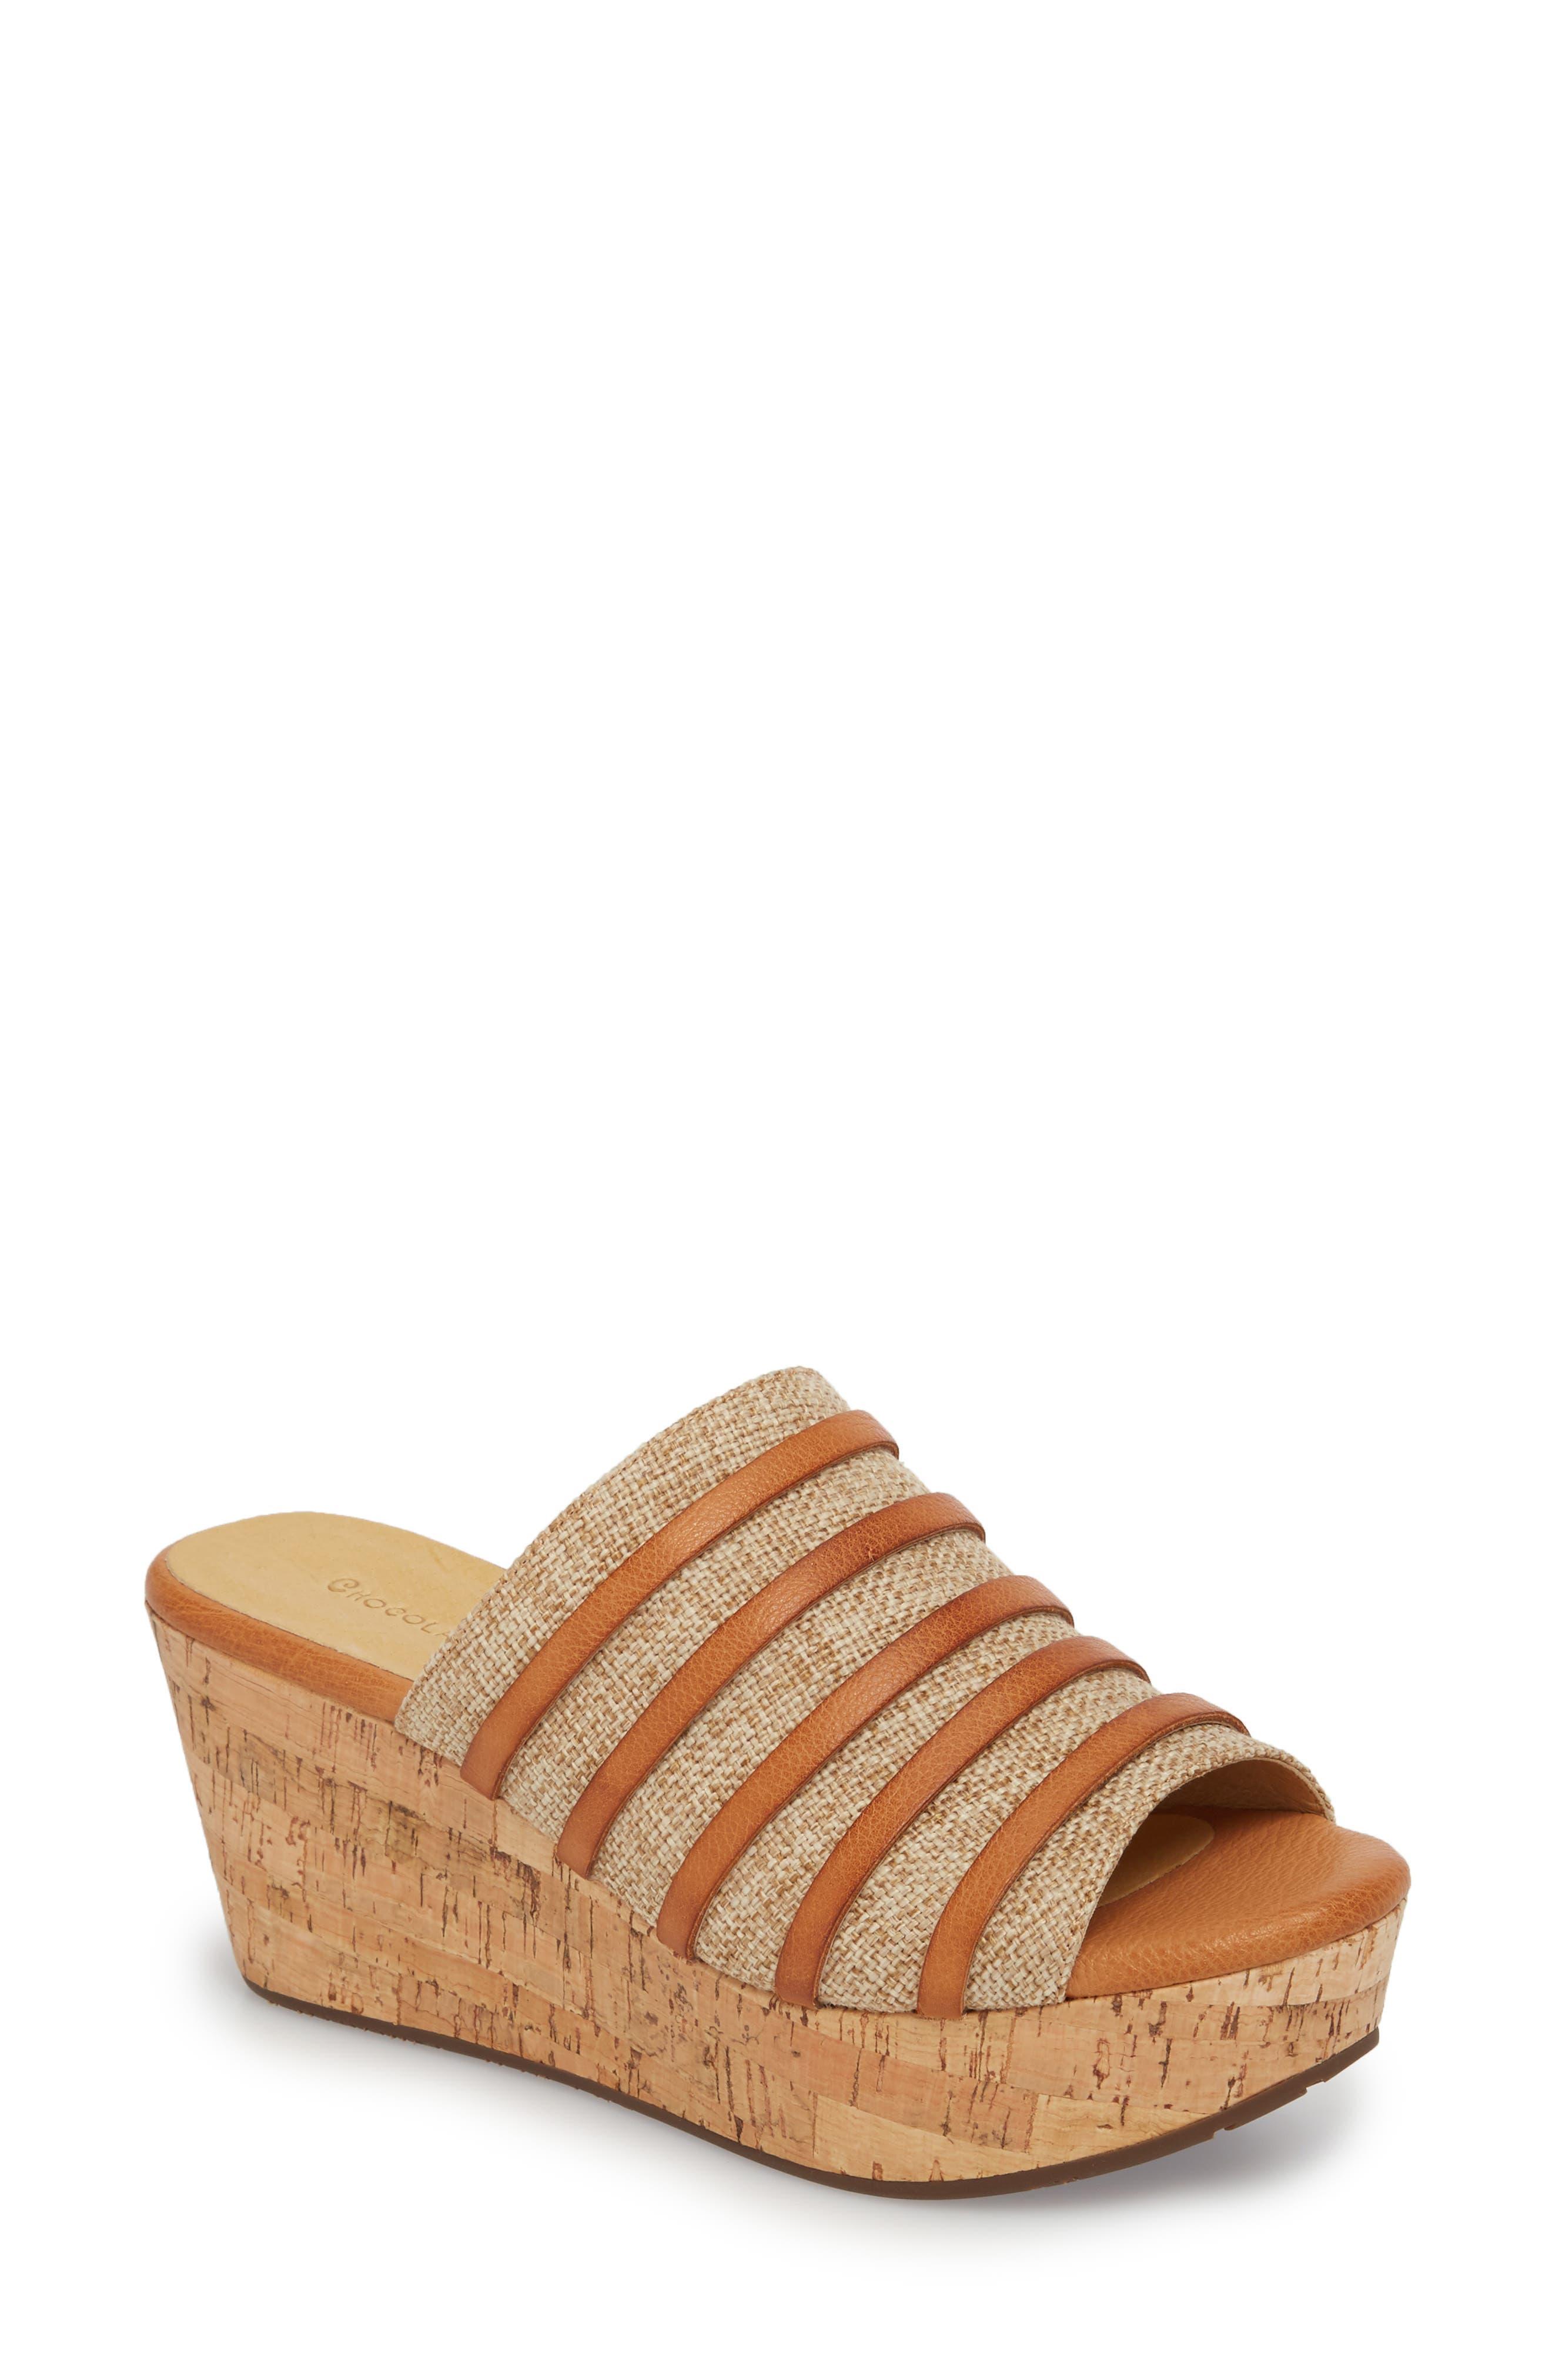 Wapi Wedge Sandal,                         Main,                         color, Camel Leather